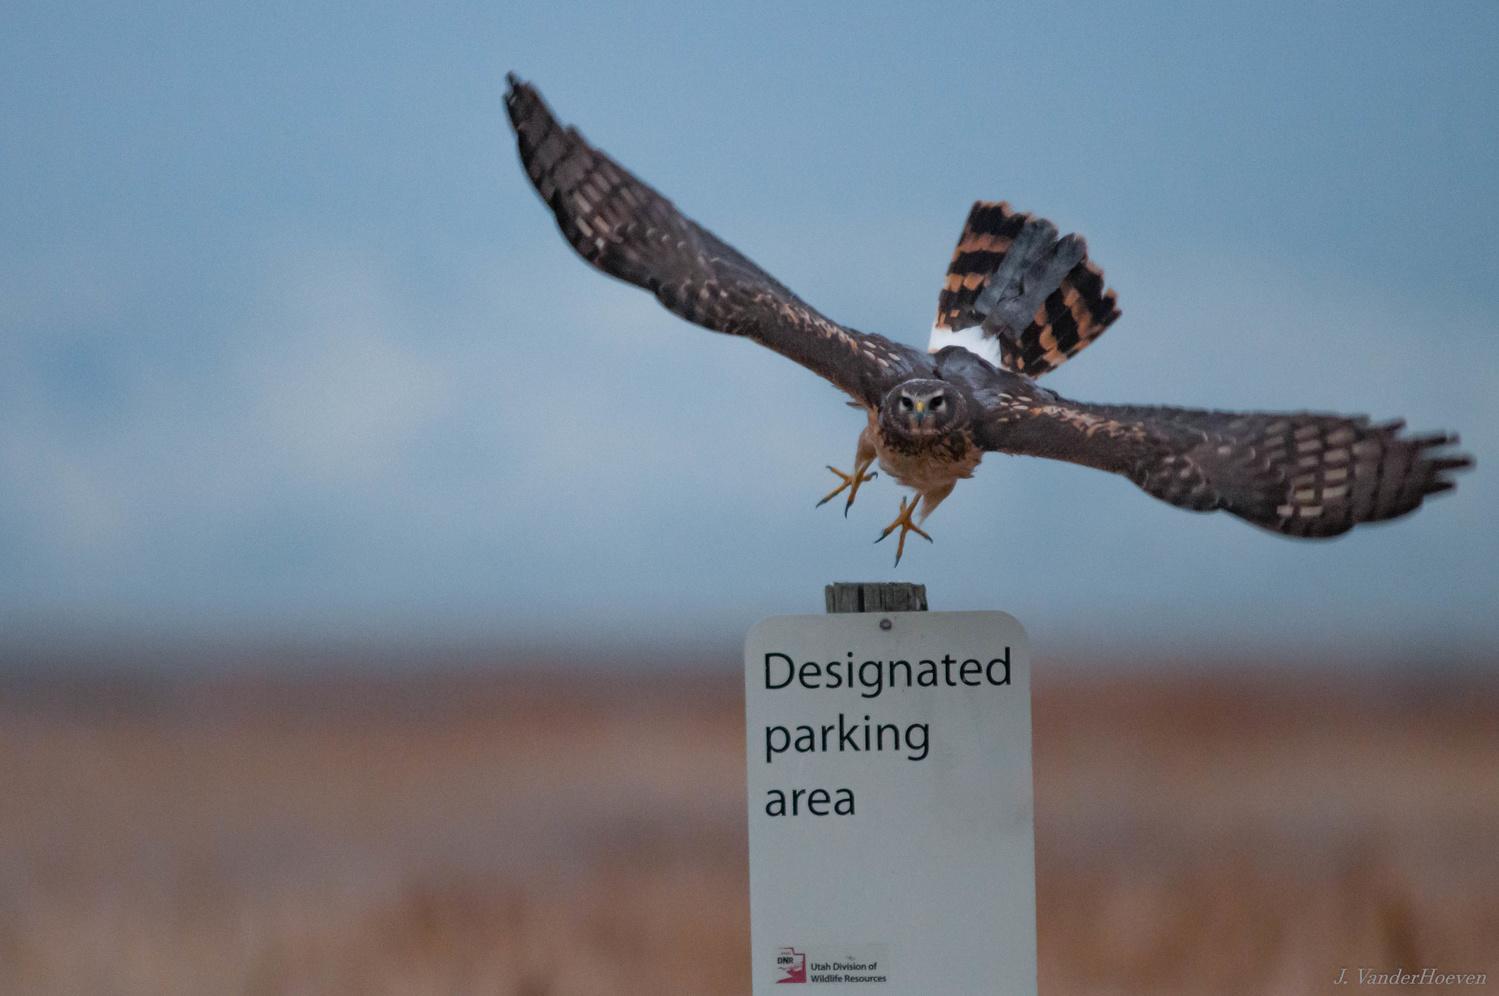 No Parking by Jake VanderHoeven